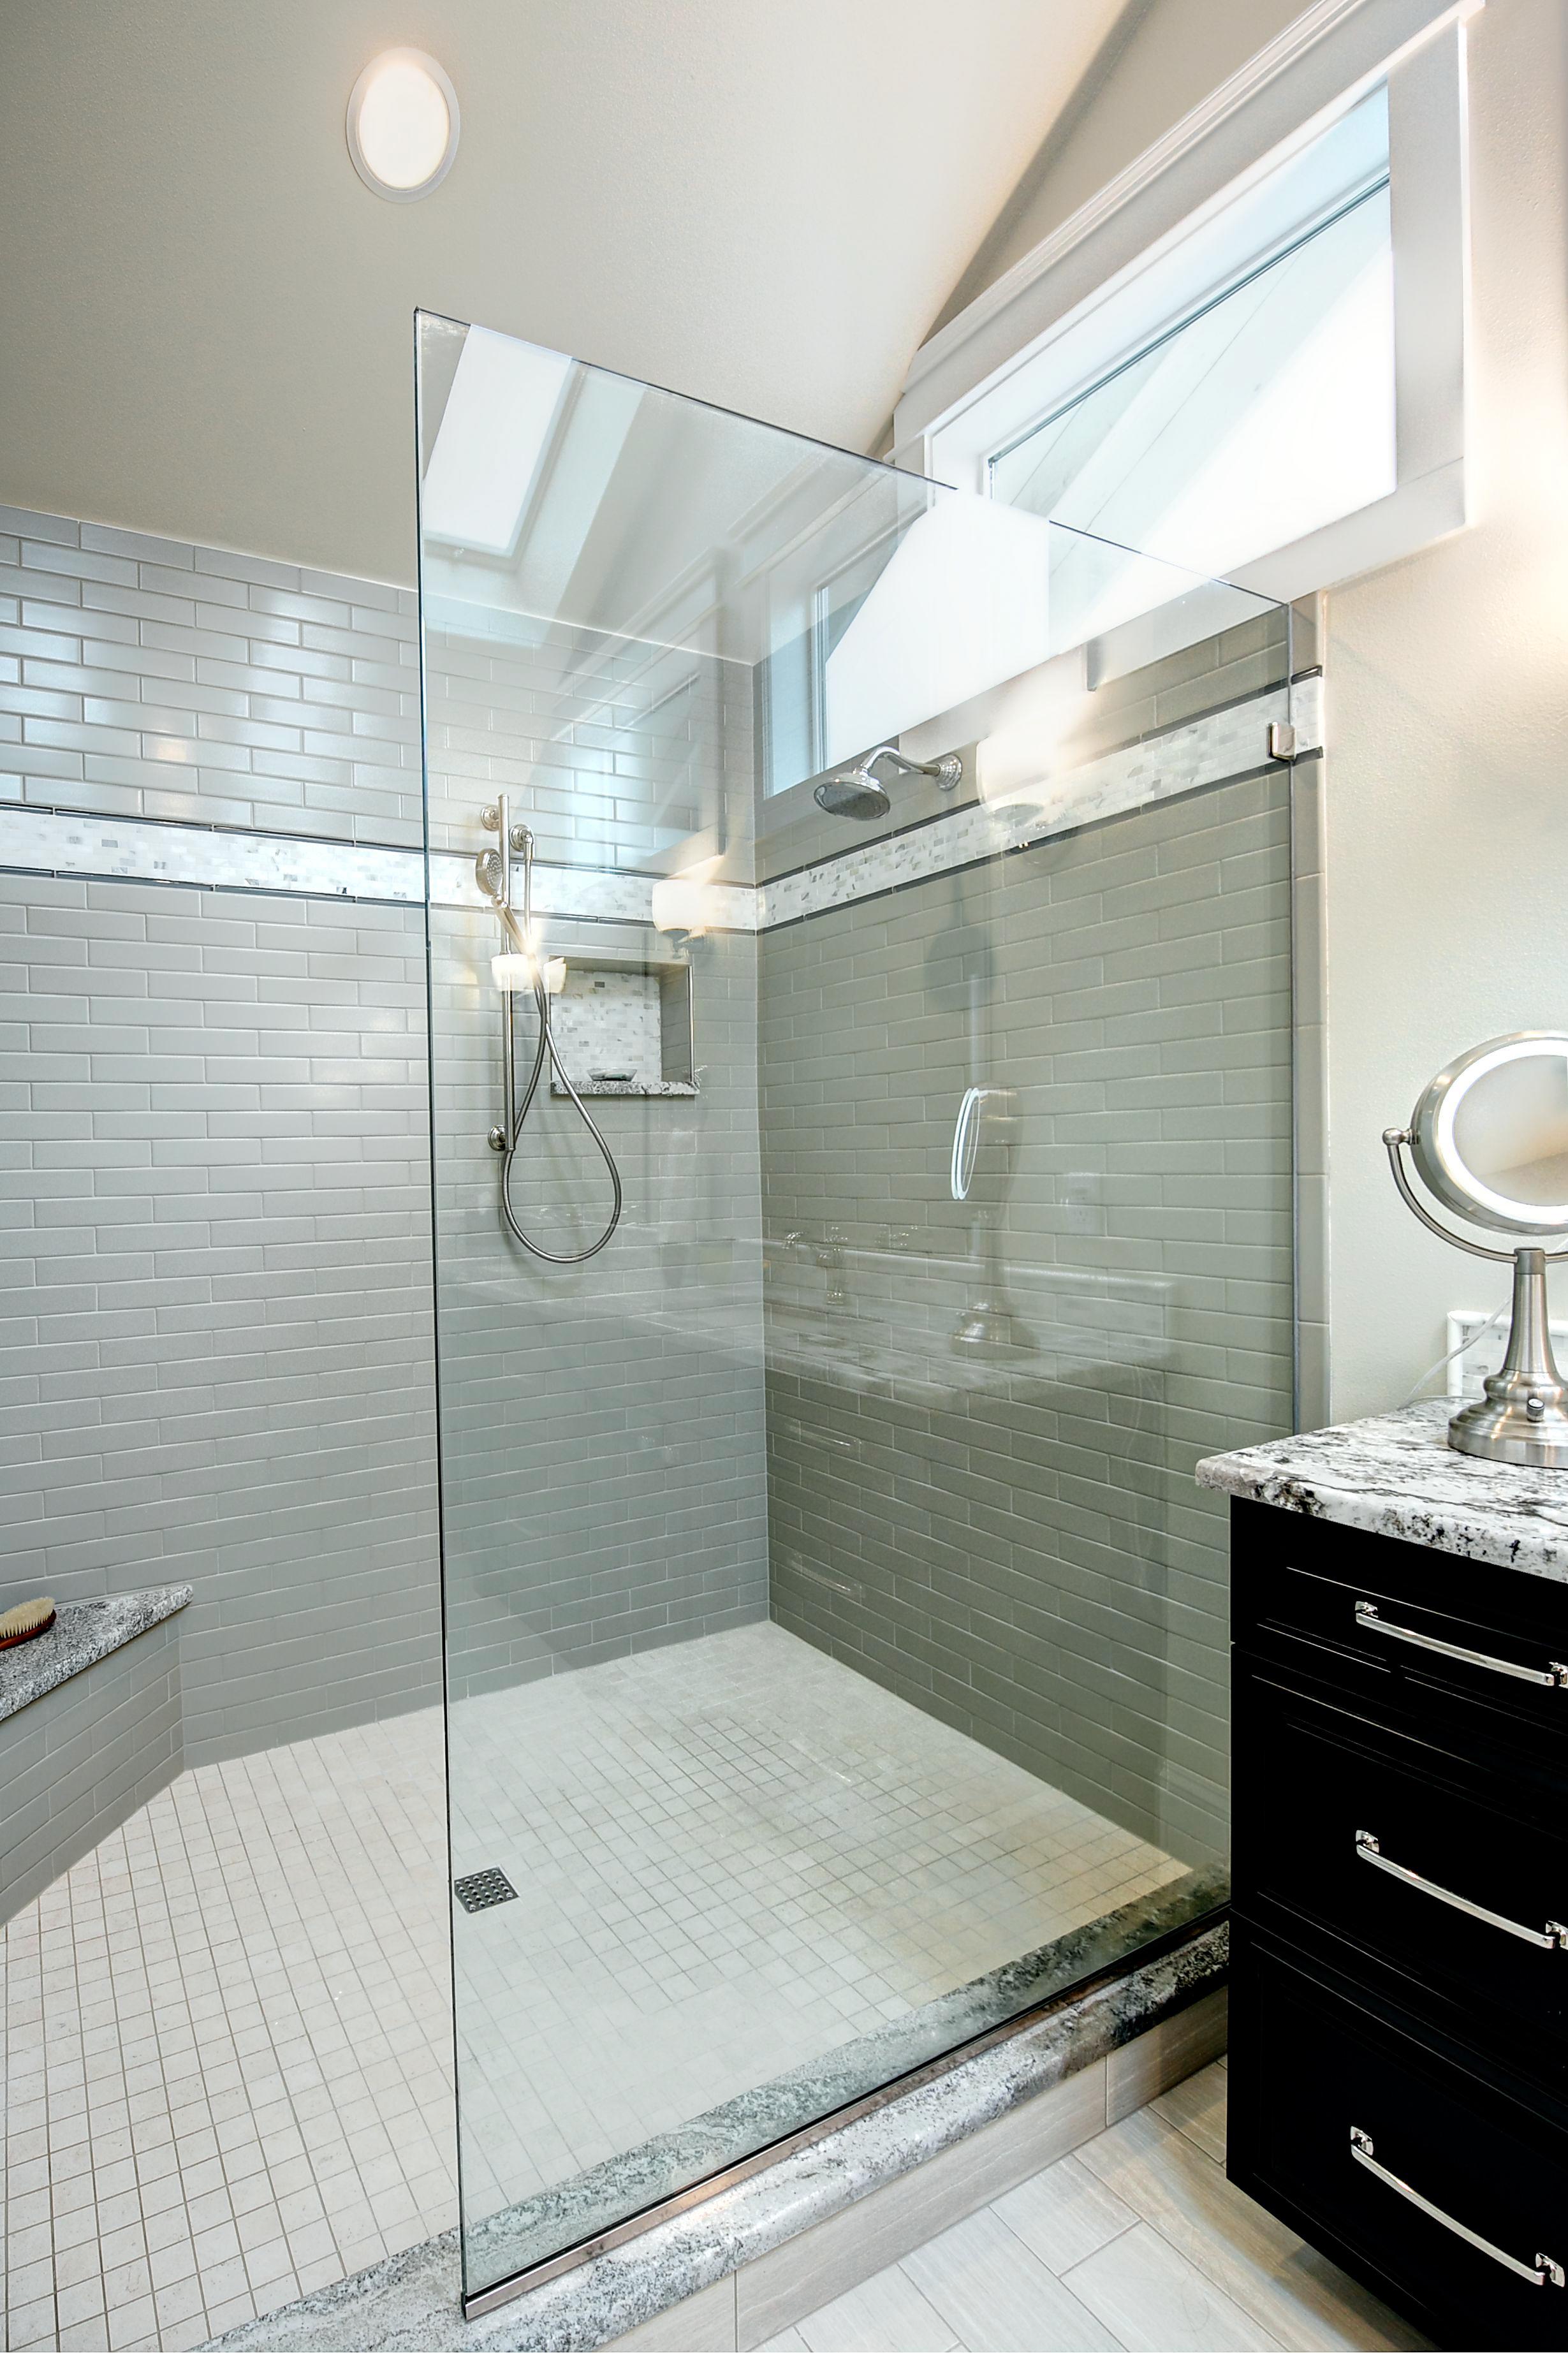 mandy callaway interiors-greenlake house-00023.jpg